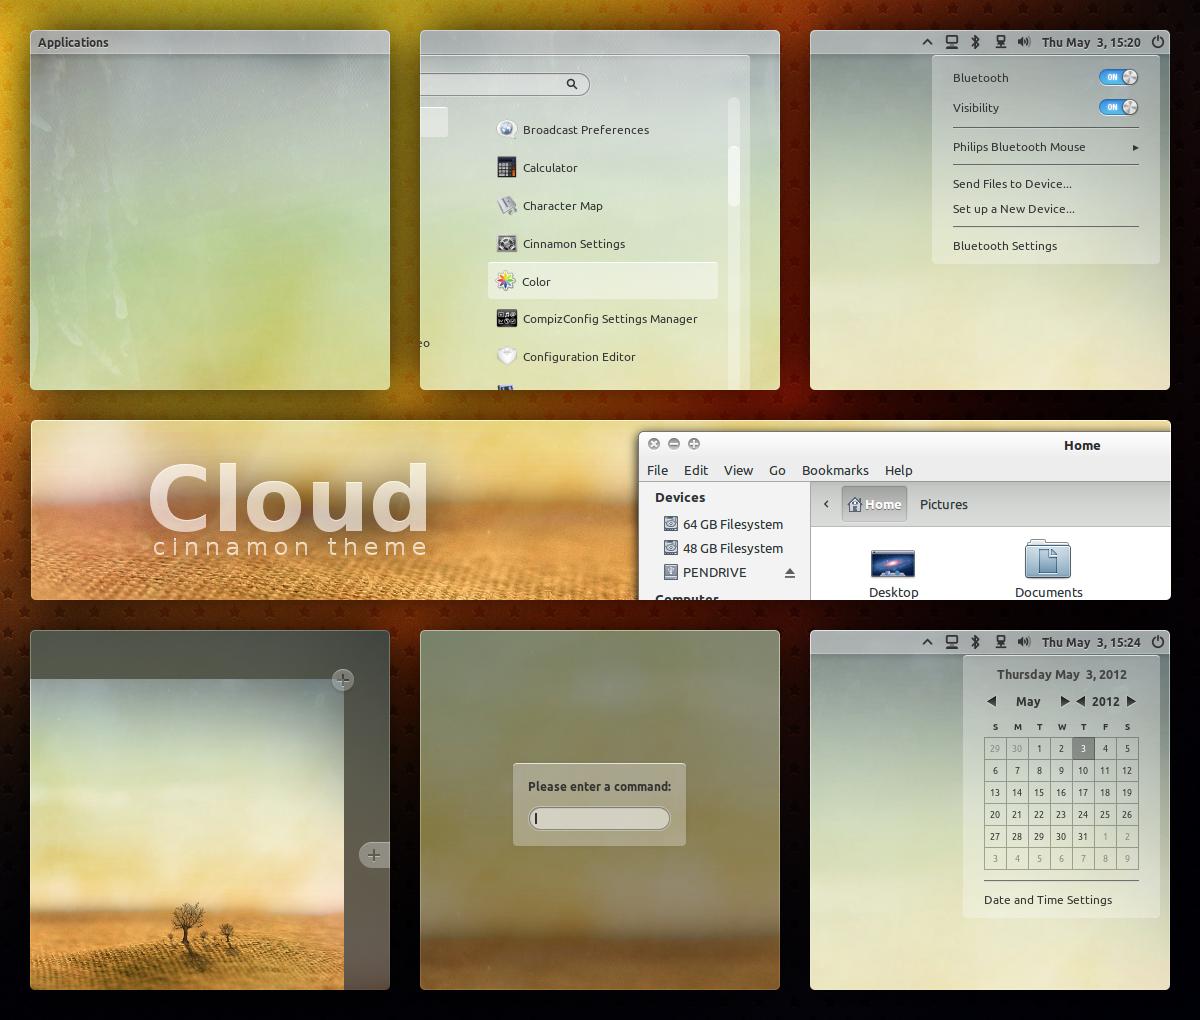 Cloud - Cinnamon Theme